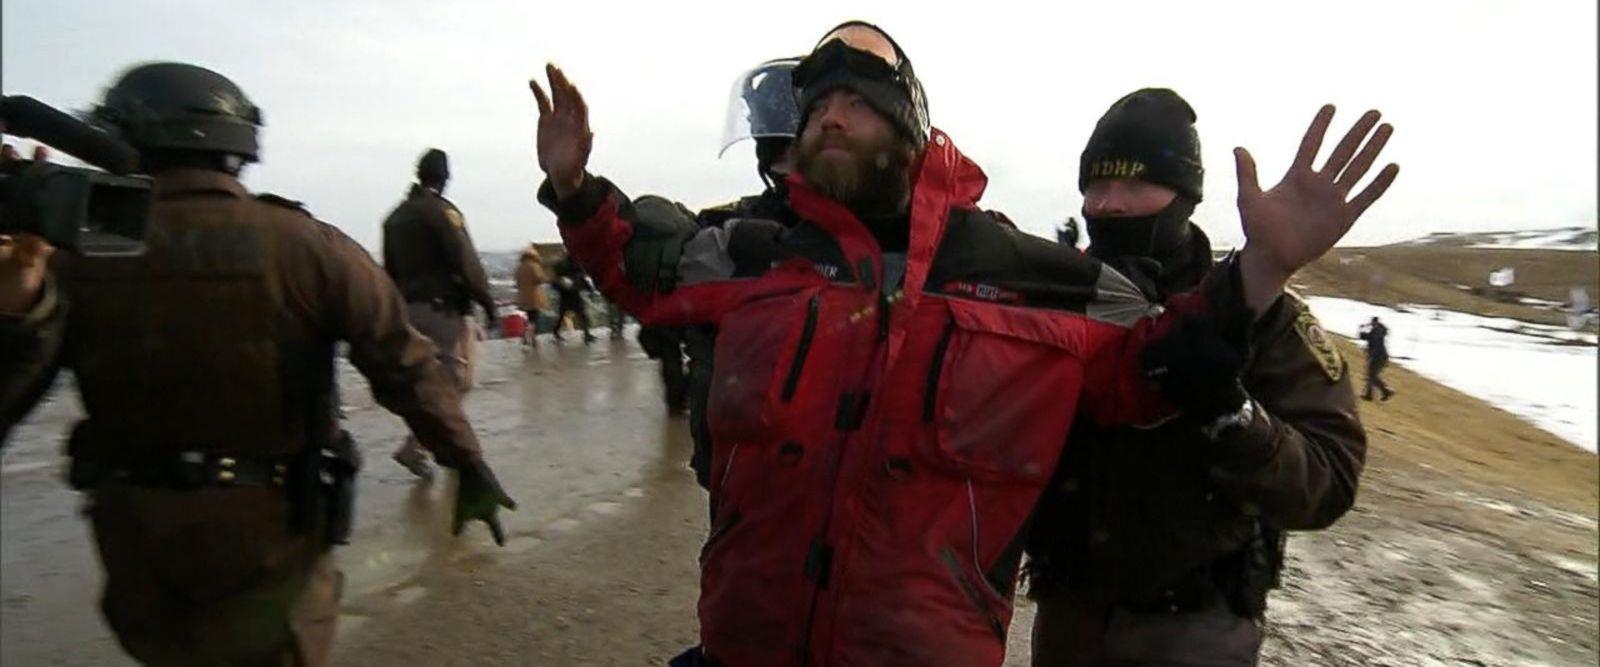 VIDEO: Dramatic final showdown over the Dakota Access Pipeline